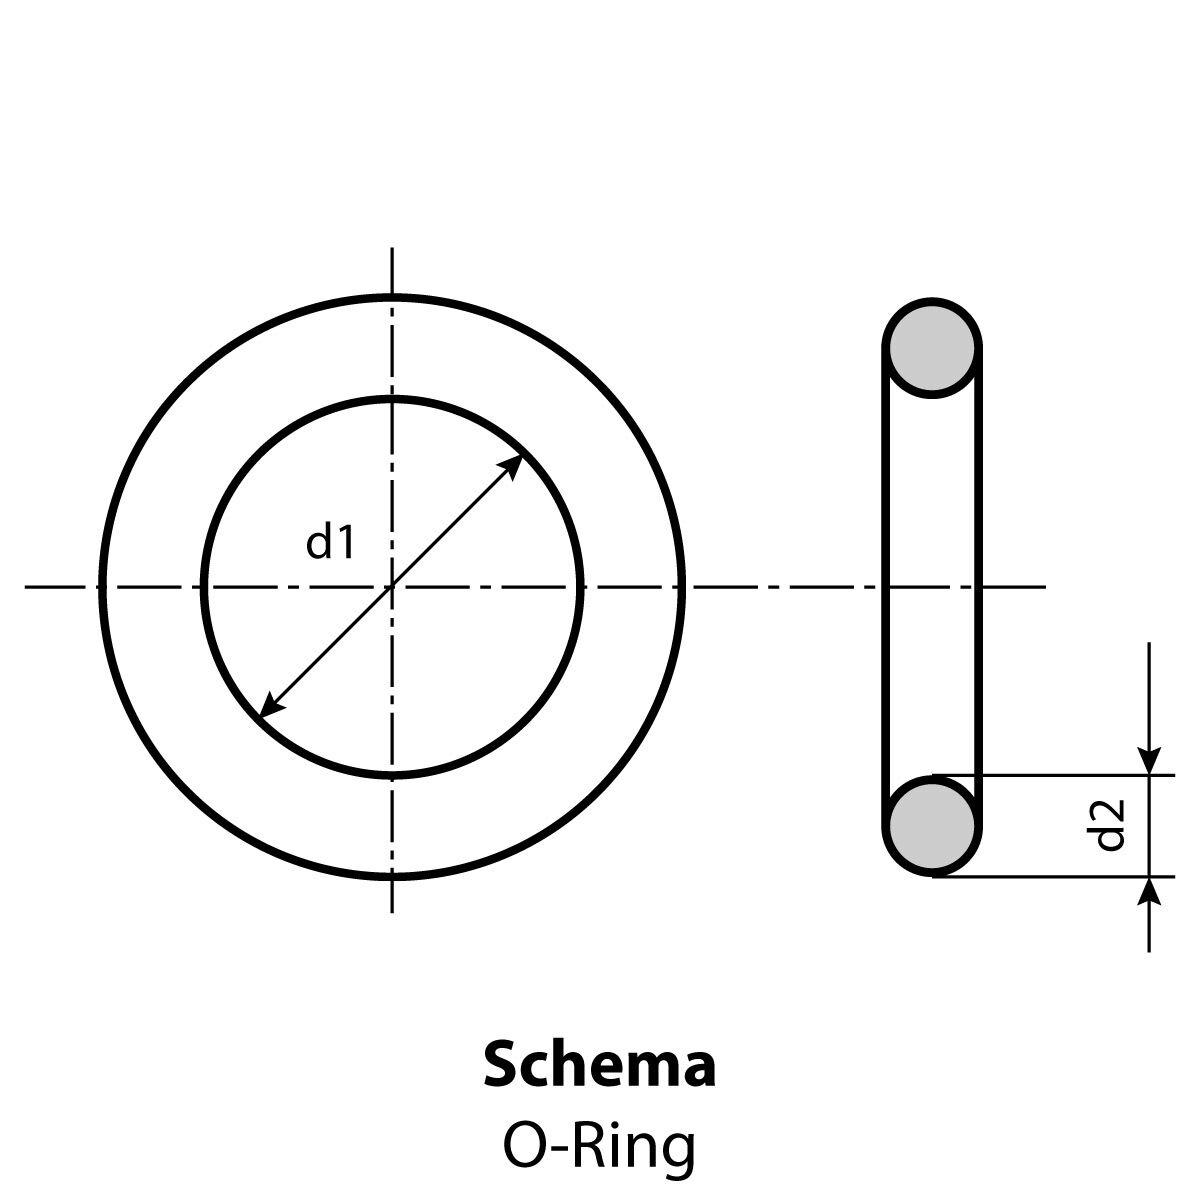 Anillo obturador/O-Ring 33,3 33,3 33,3 x 2,4 mm interurbana 80-negro o marrón, cantidad 25 unid. 2f7363